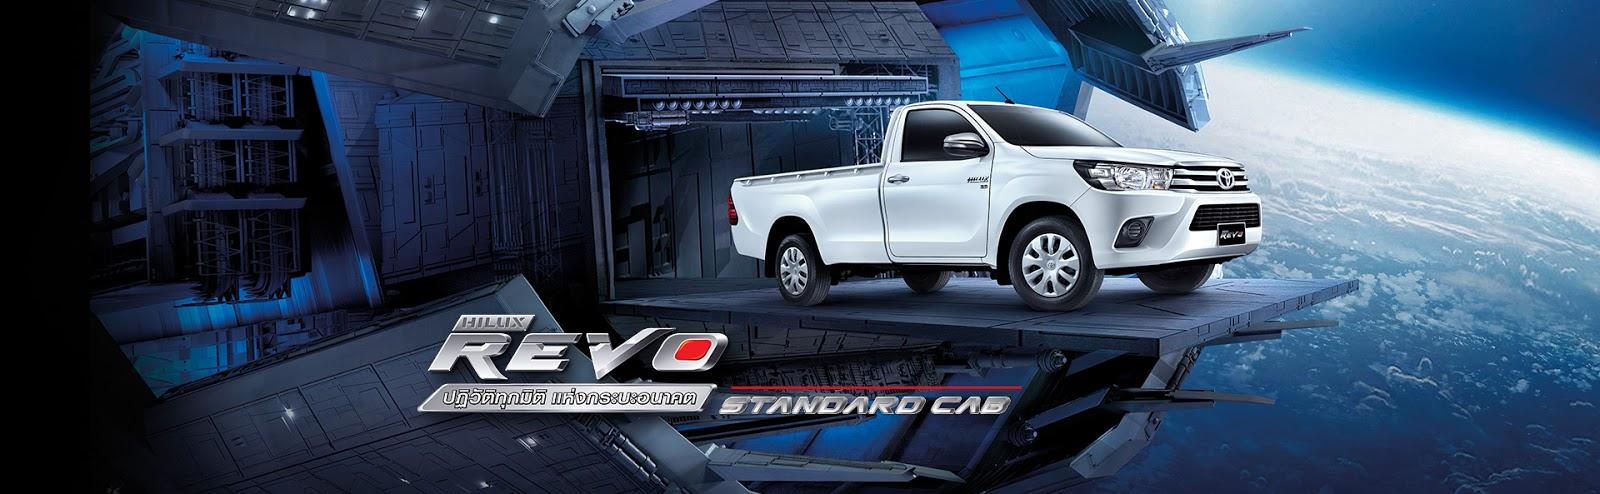 Photo of โตโยต้า ไฮลีกซ์ รีโว่รุ่นมาตรฐาน Toyota Hilux Revo Standard Cab